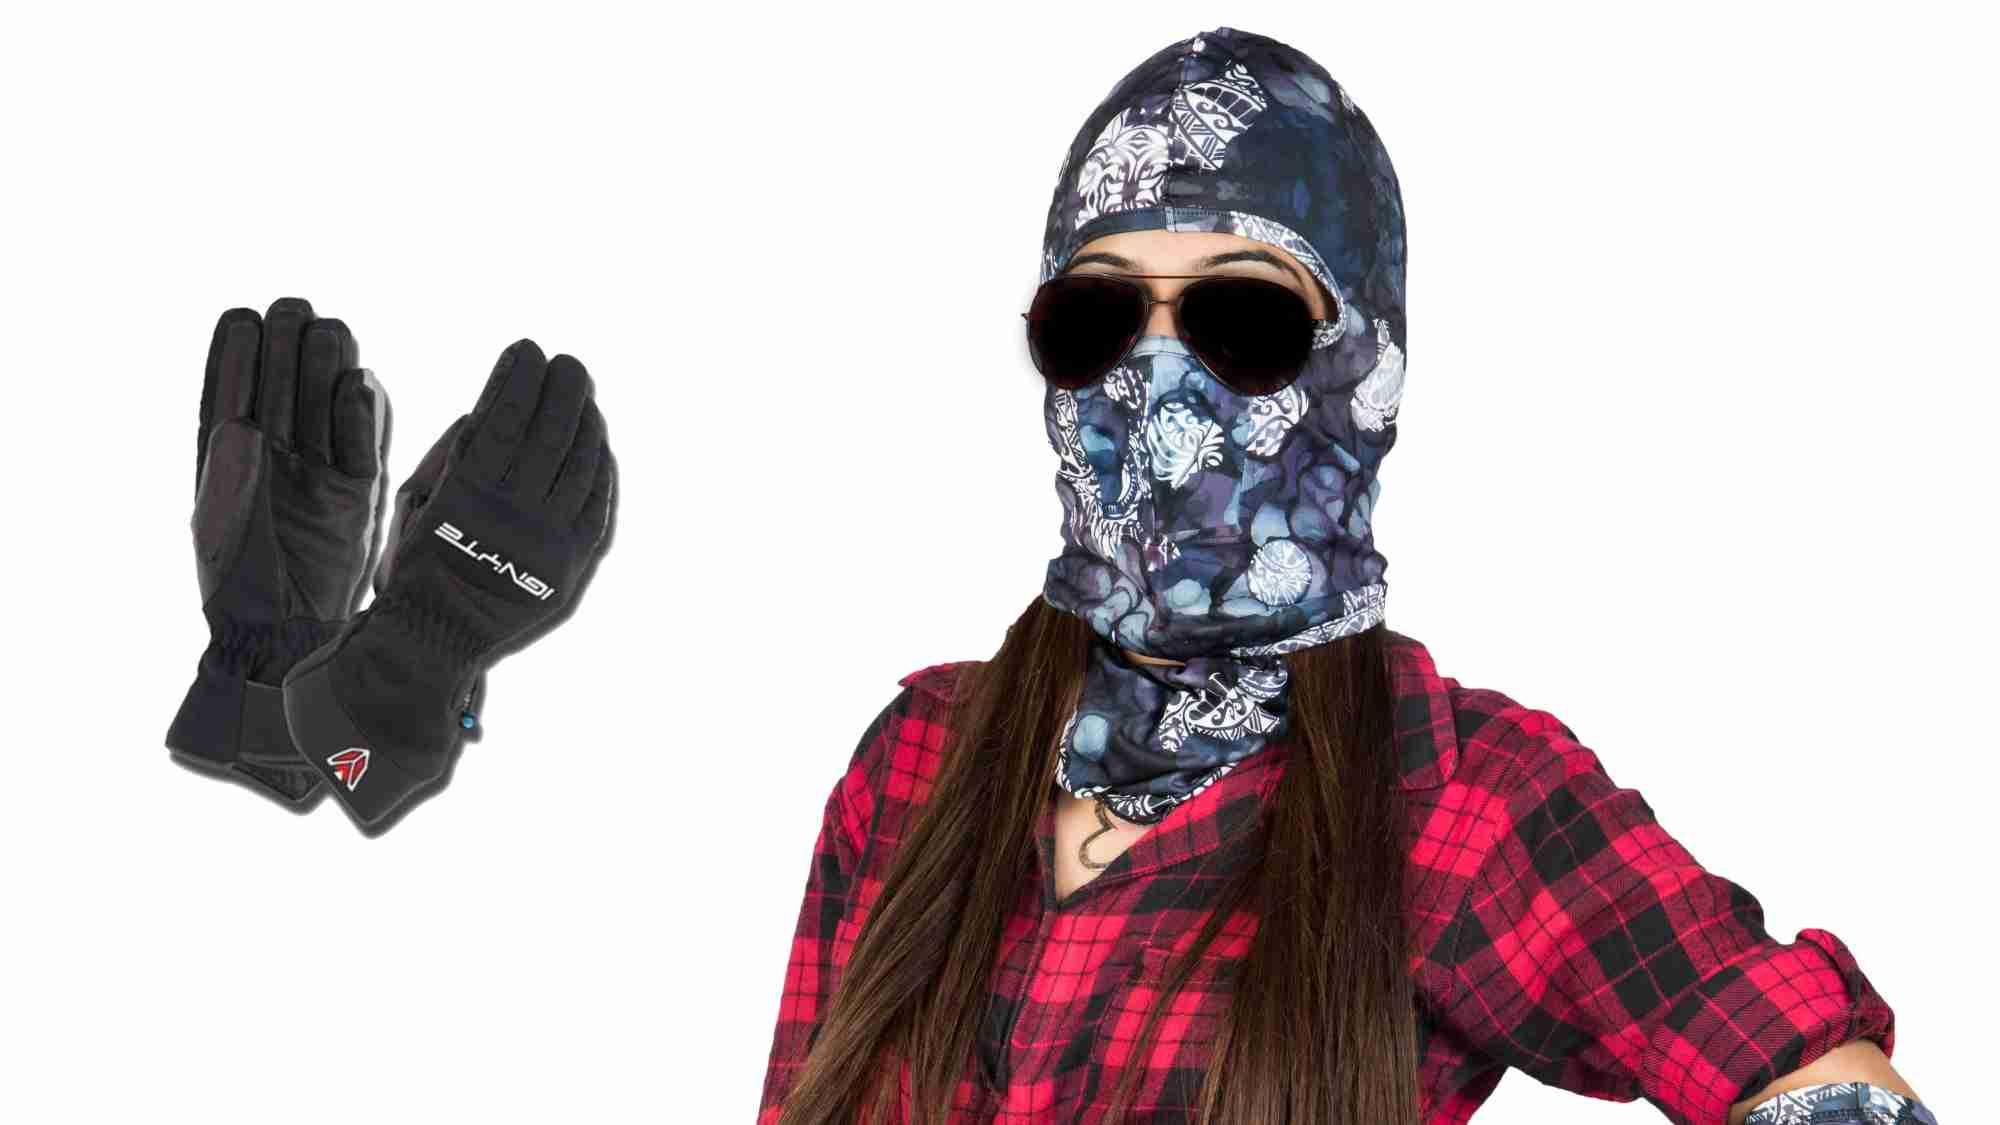 IGNYTE BalaClava and gloves